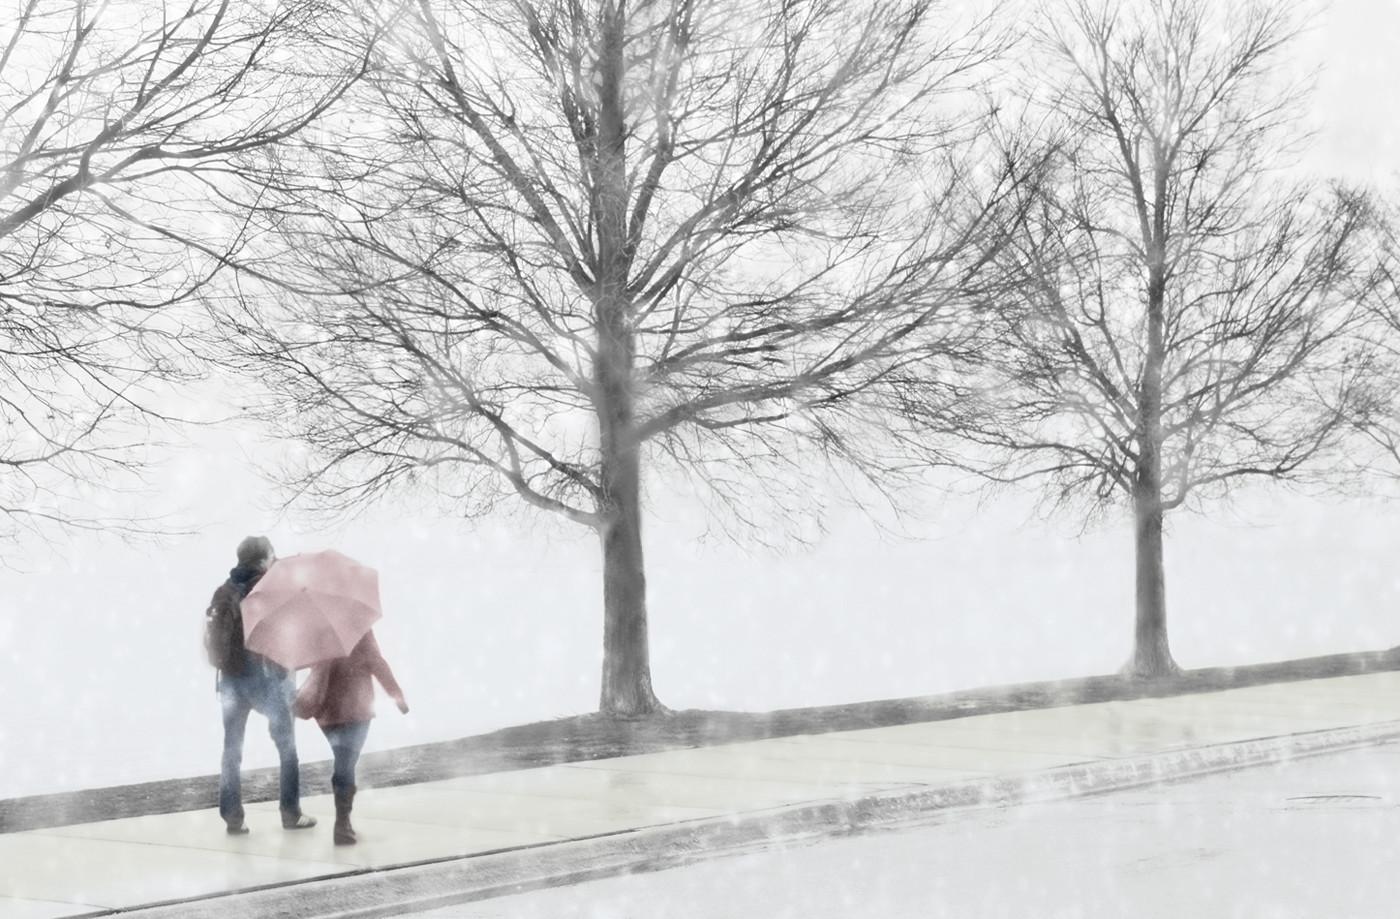 17 SNOWING IN CHICAGO by Pam Sherren